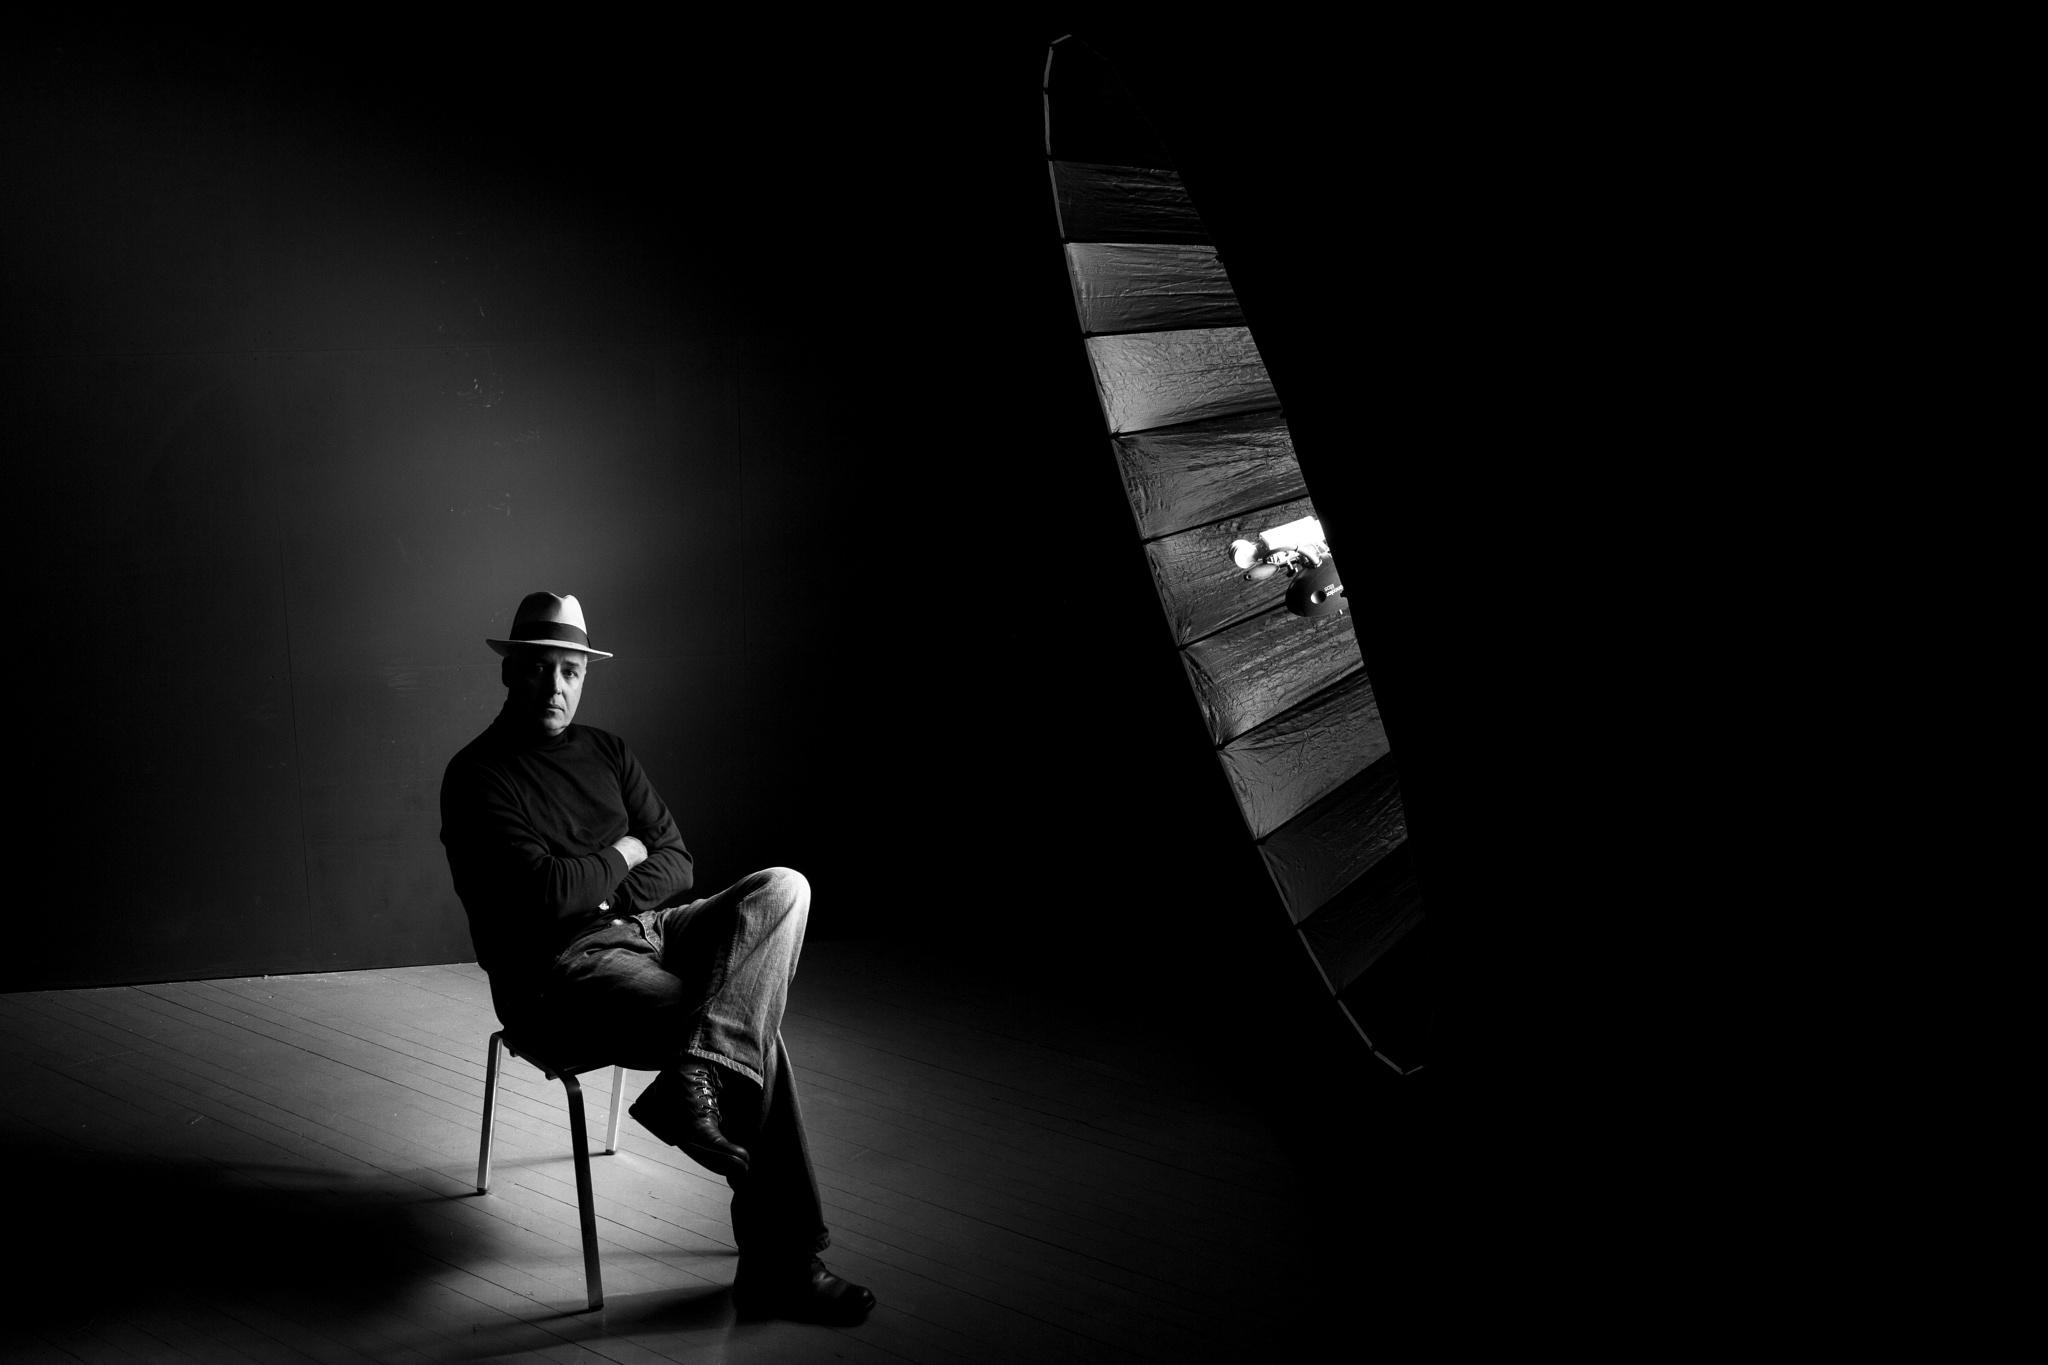 Self portrait by Steve H